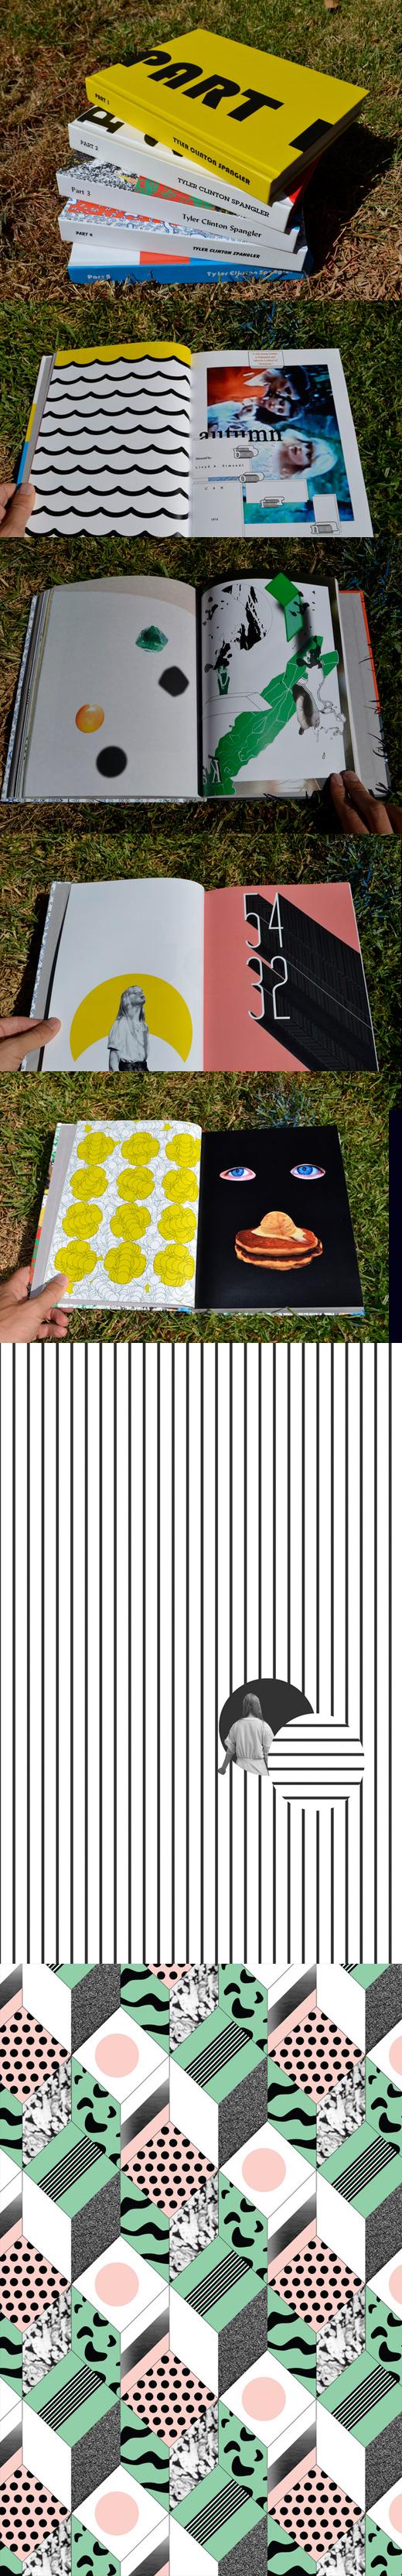 design inspiration book